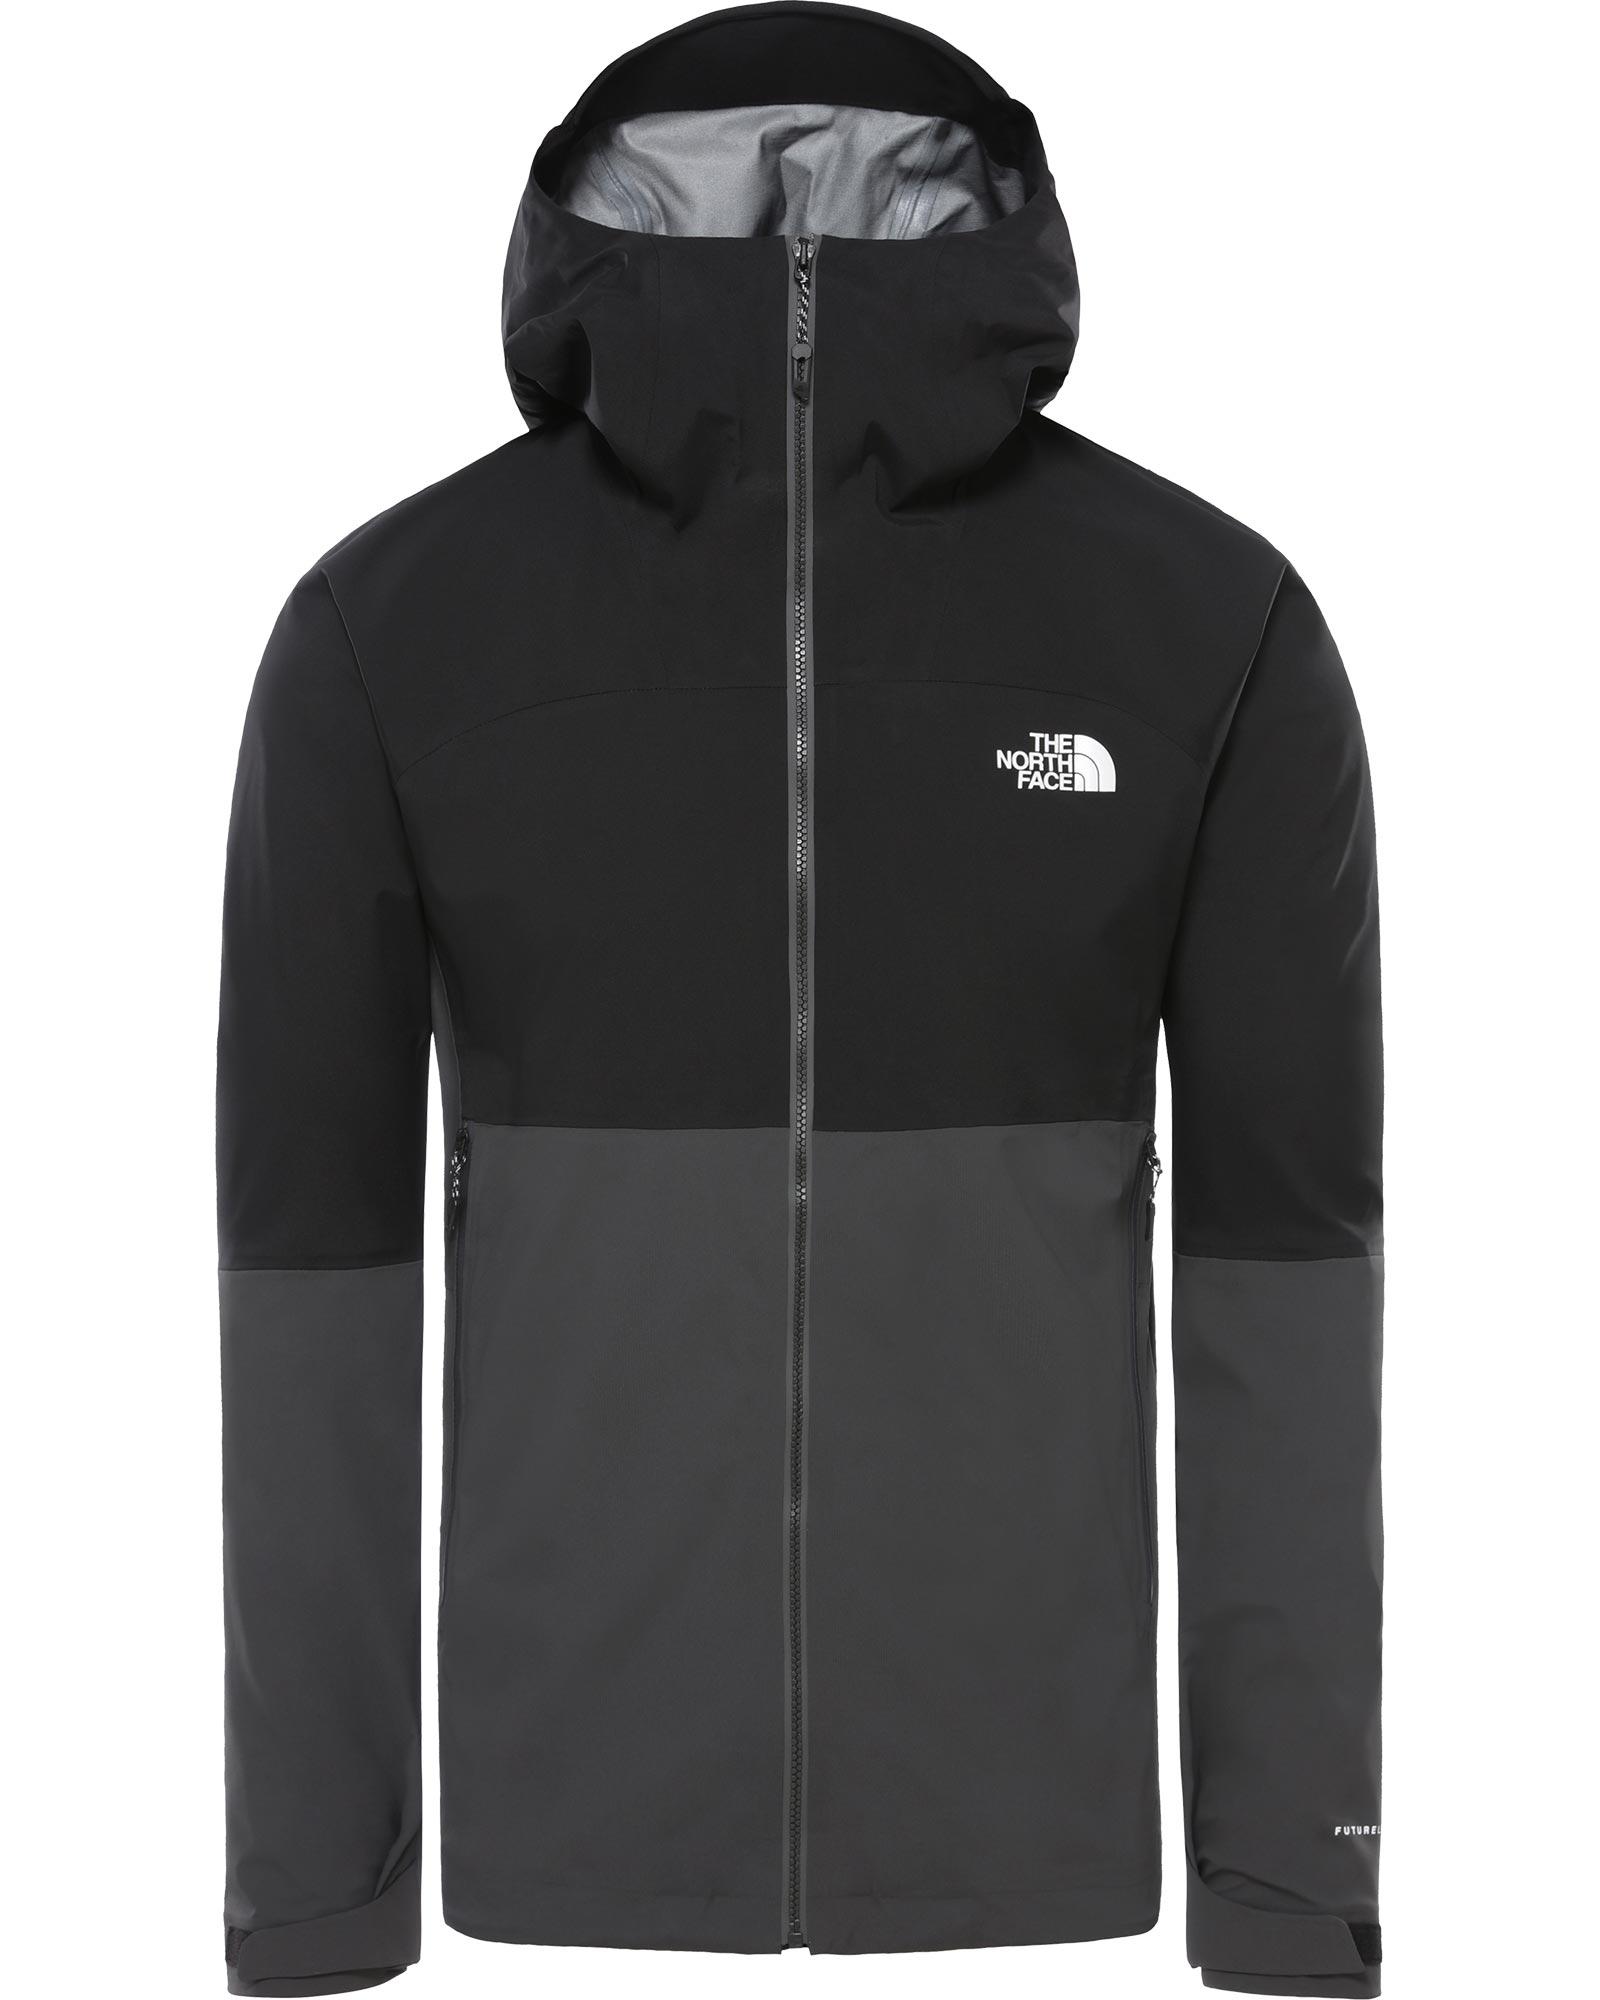 The North Face Men's Impendor FUTURELIGHT Jacket 0